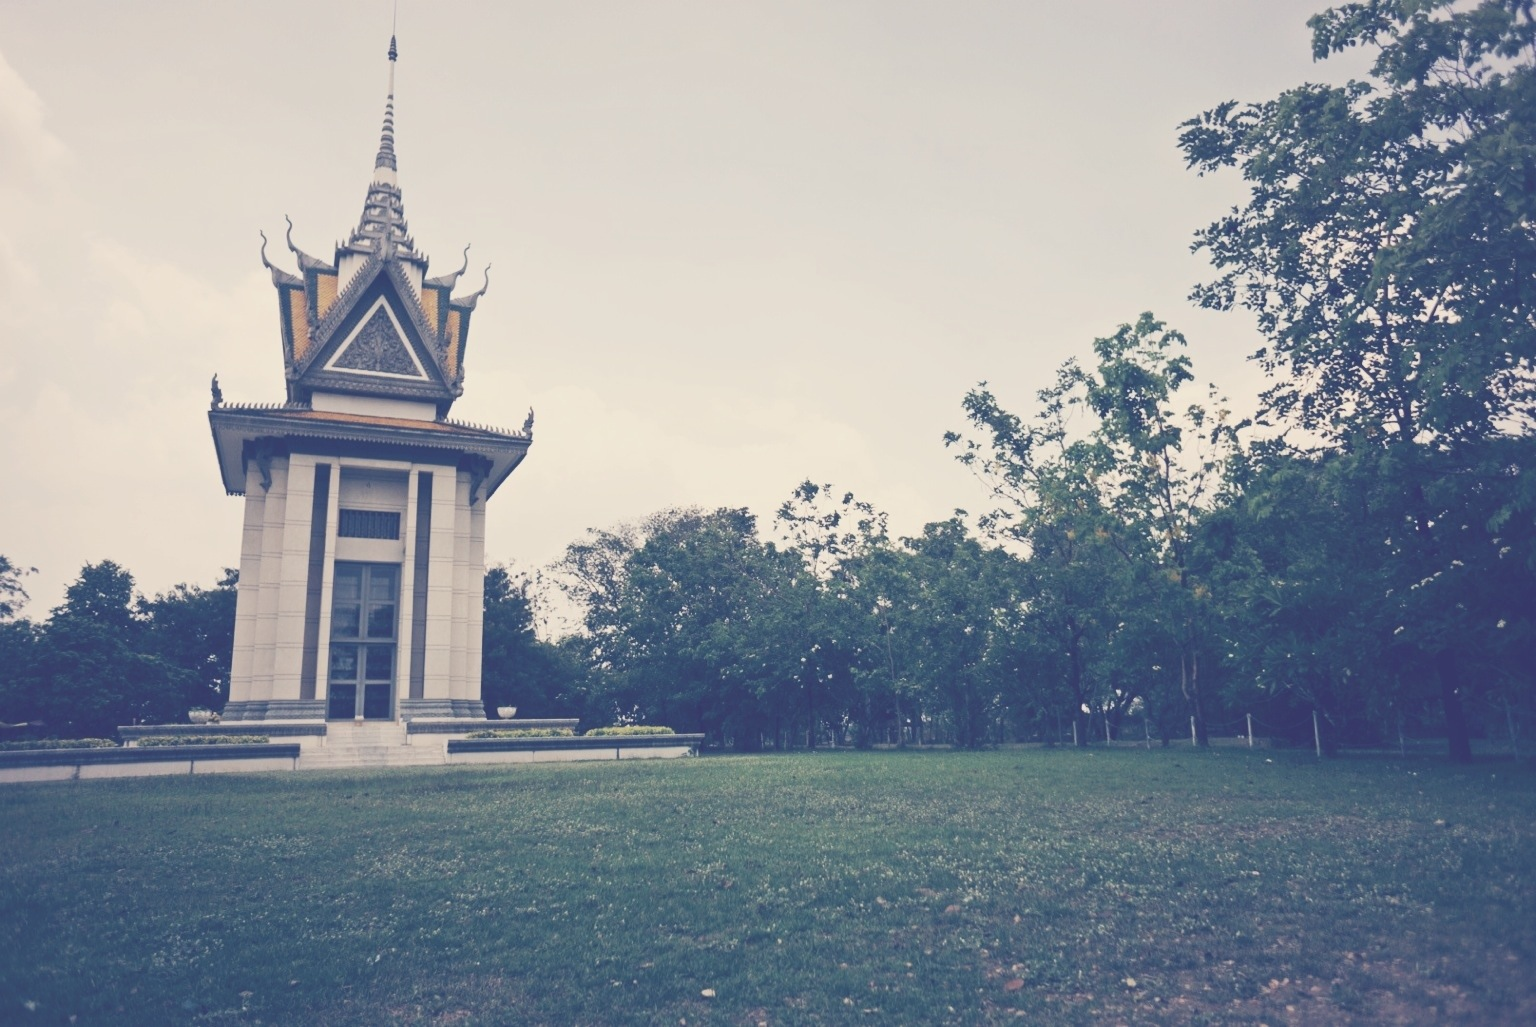 Choeung Ek, memorial stupa